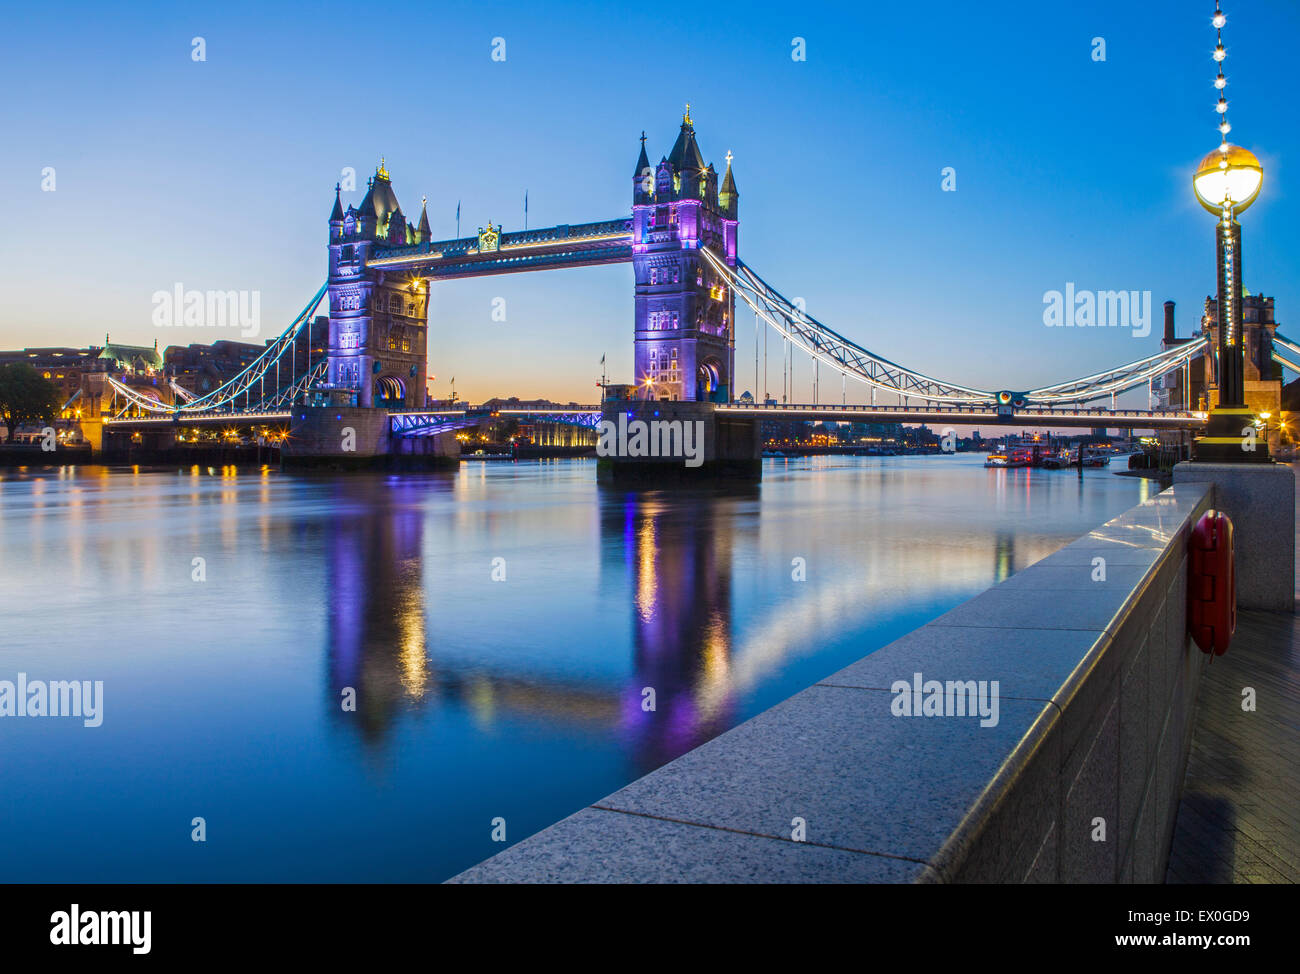 The beautiful Tower Bridge at dawn in London. - Stock Image